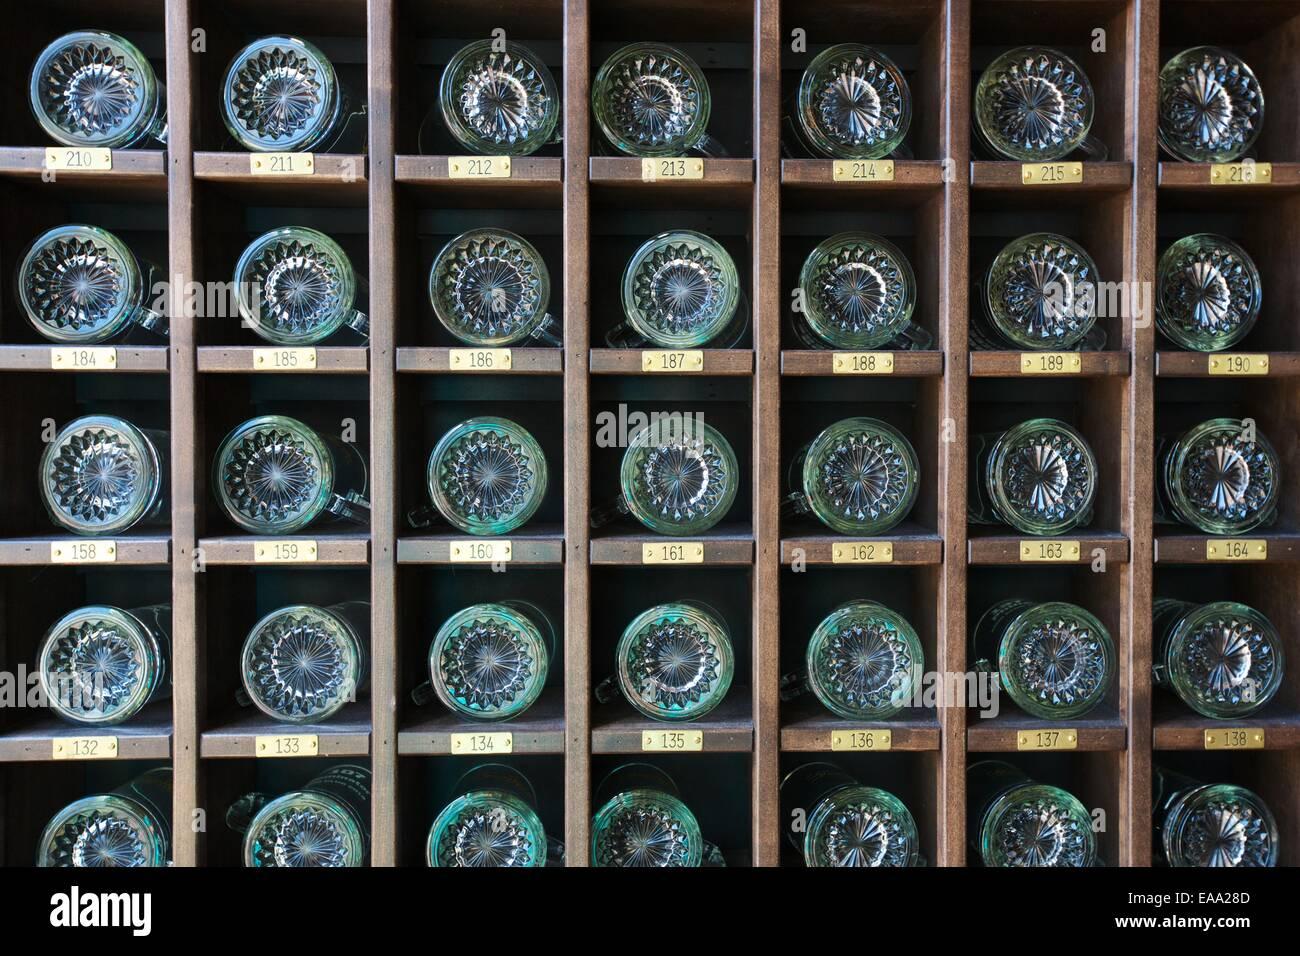 Shelf of mugs for mug club members at the Grand Rapids Brewing Company - Stock Image